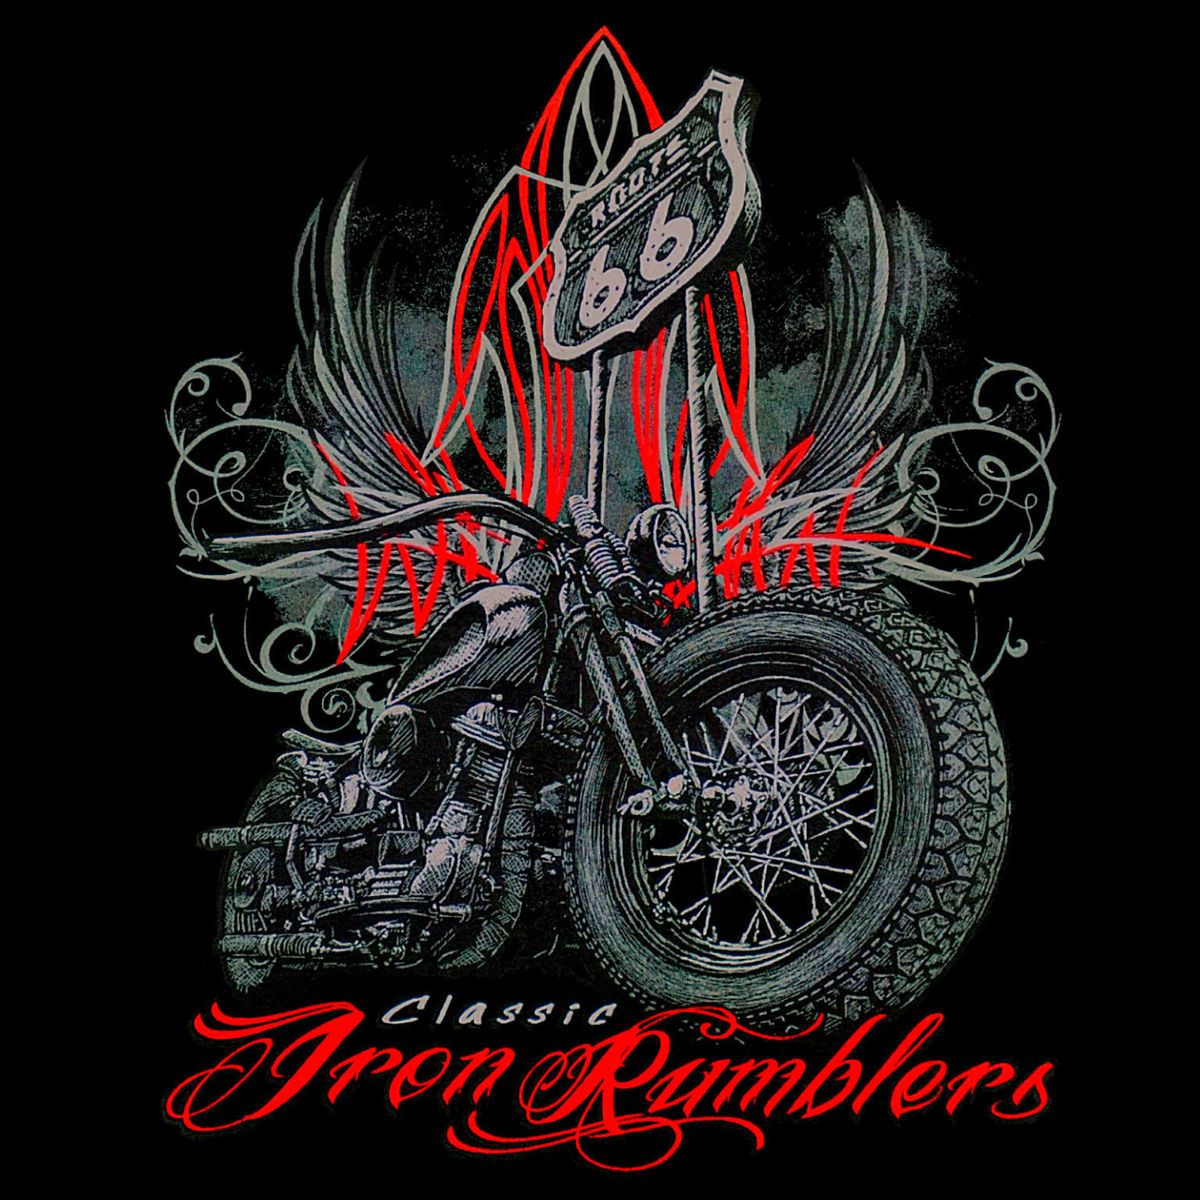 Biker Motorrad Chopper Oldtimer Bike Motorcycle T Shirt Route 66 *4296